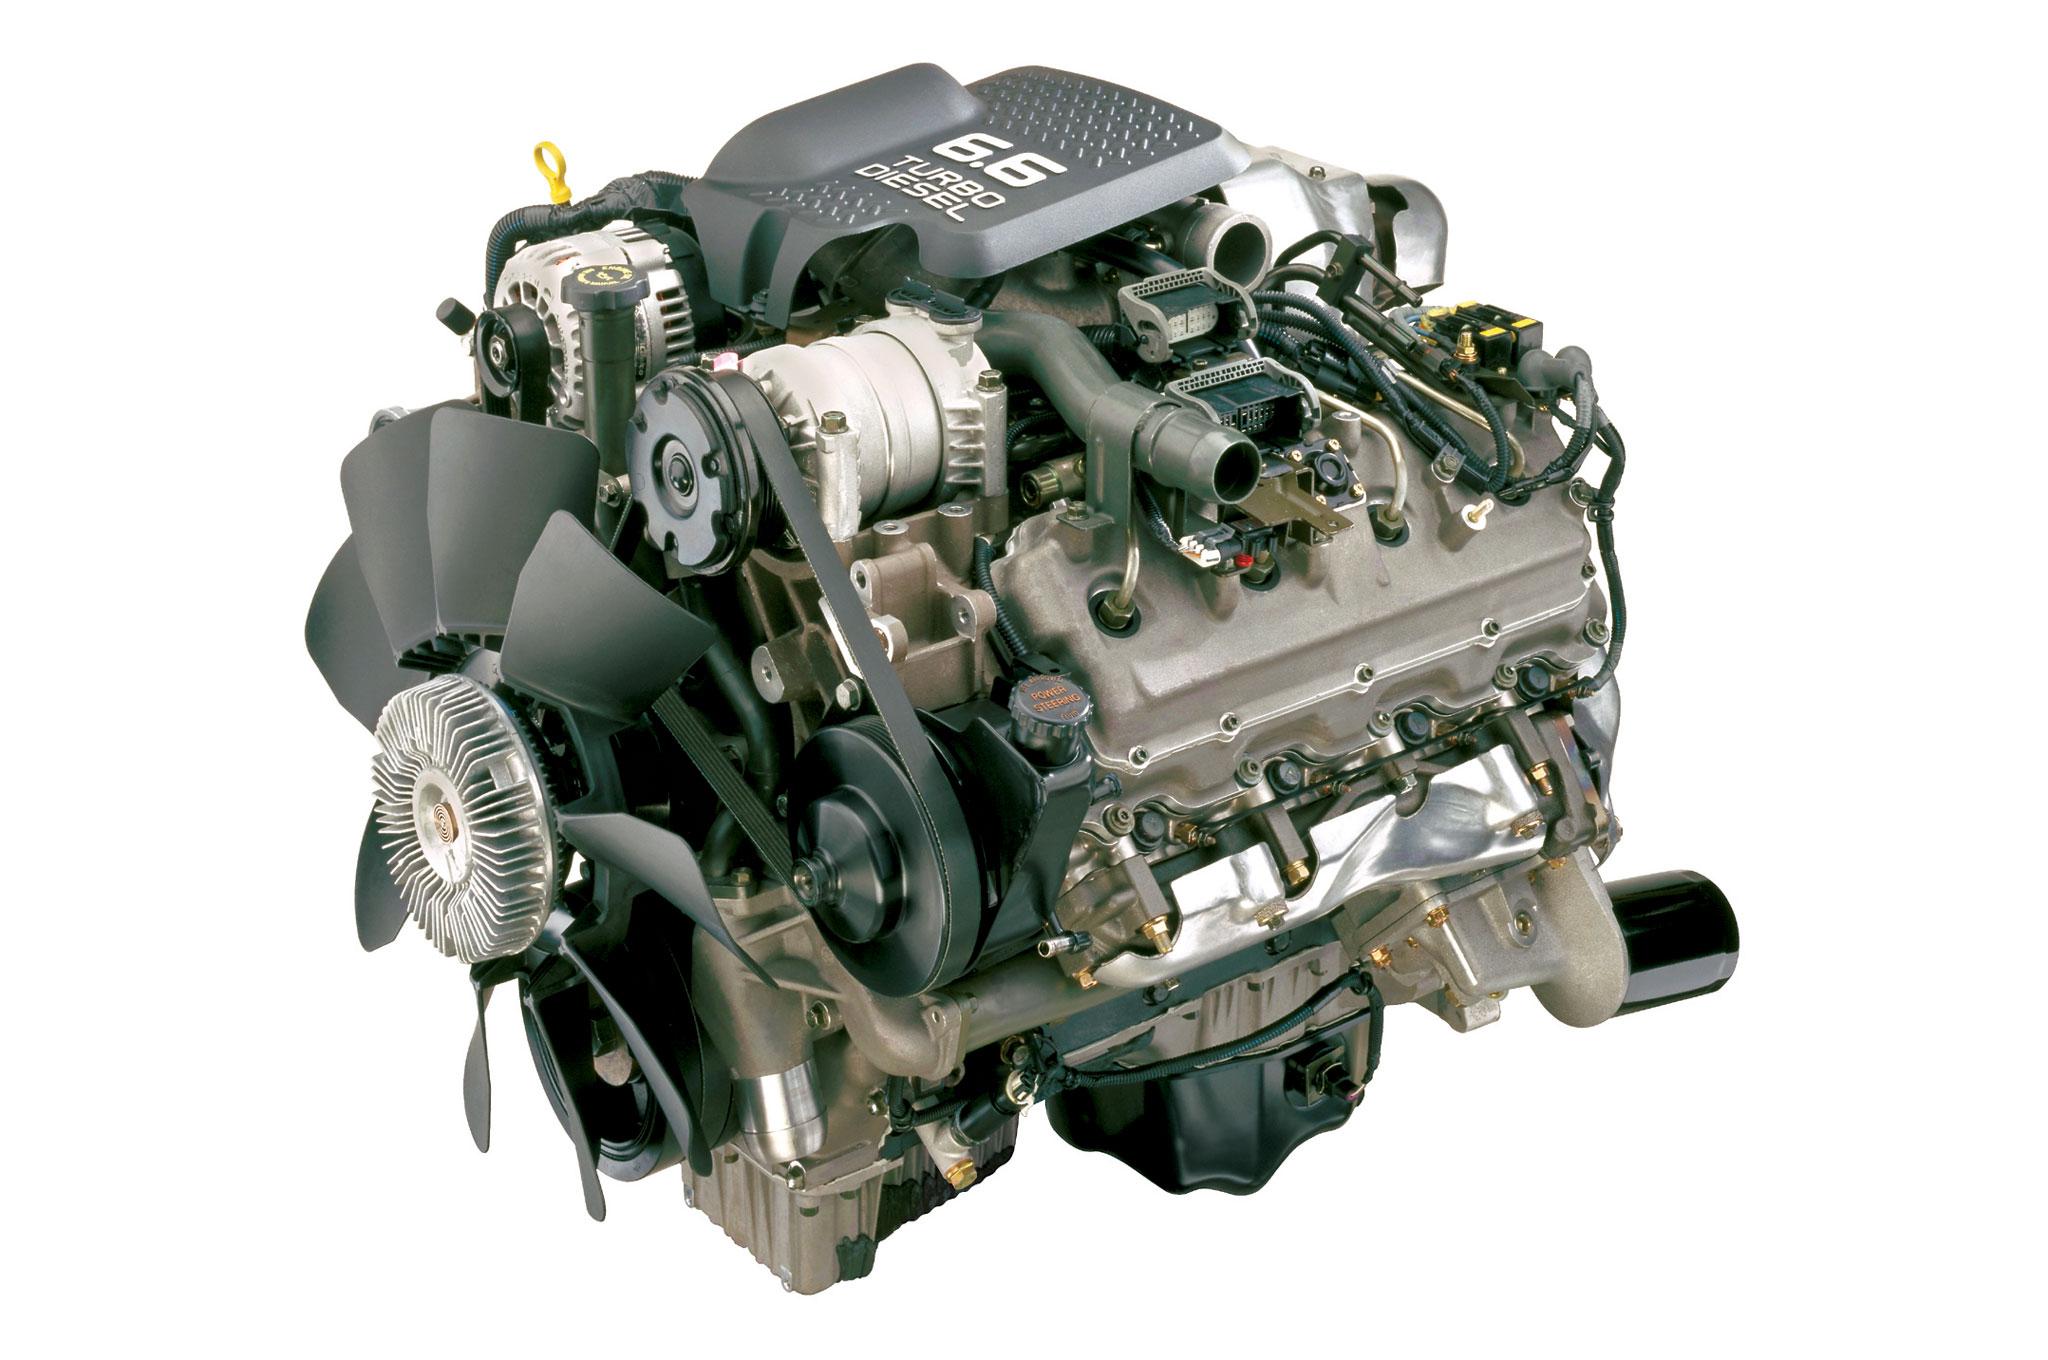 Gm Duramax Diesel V